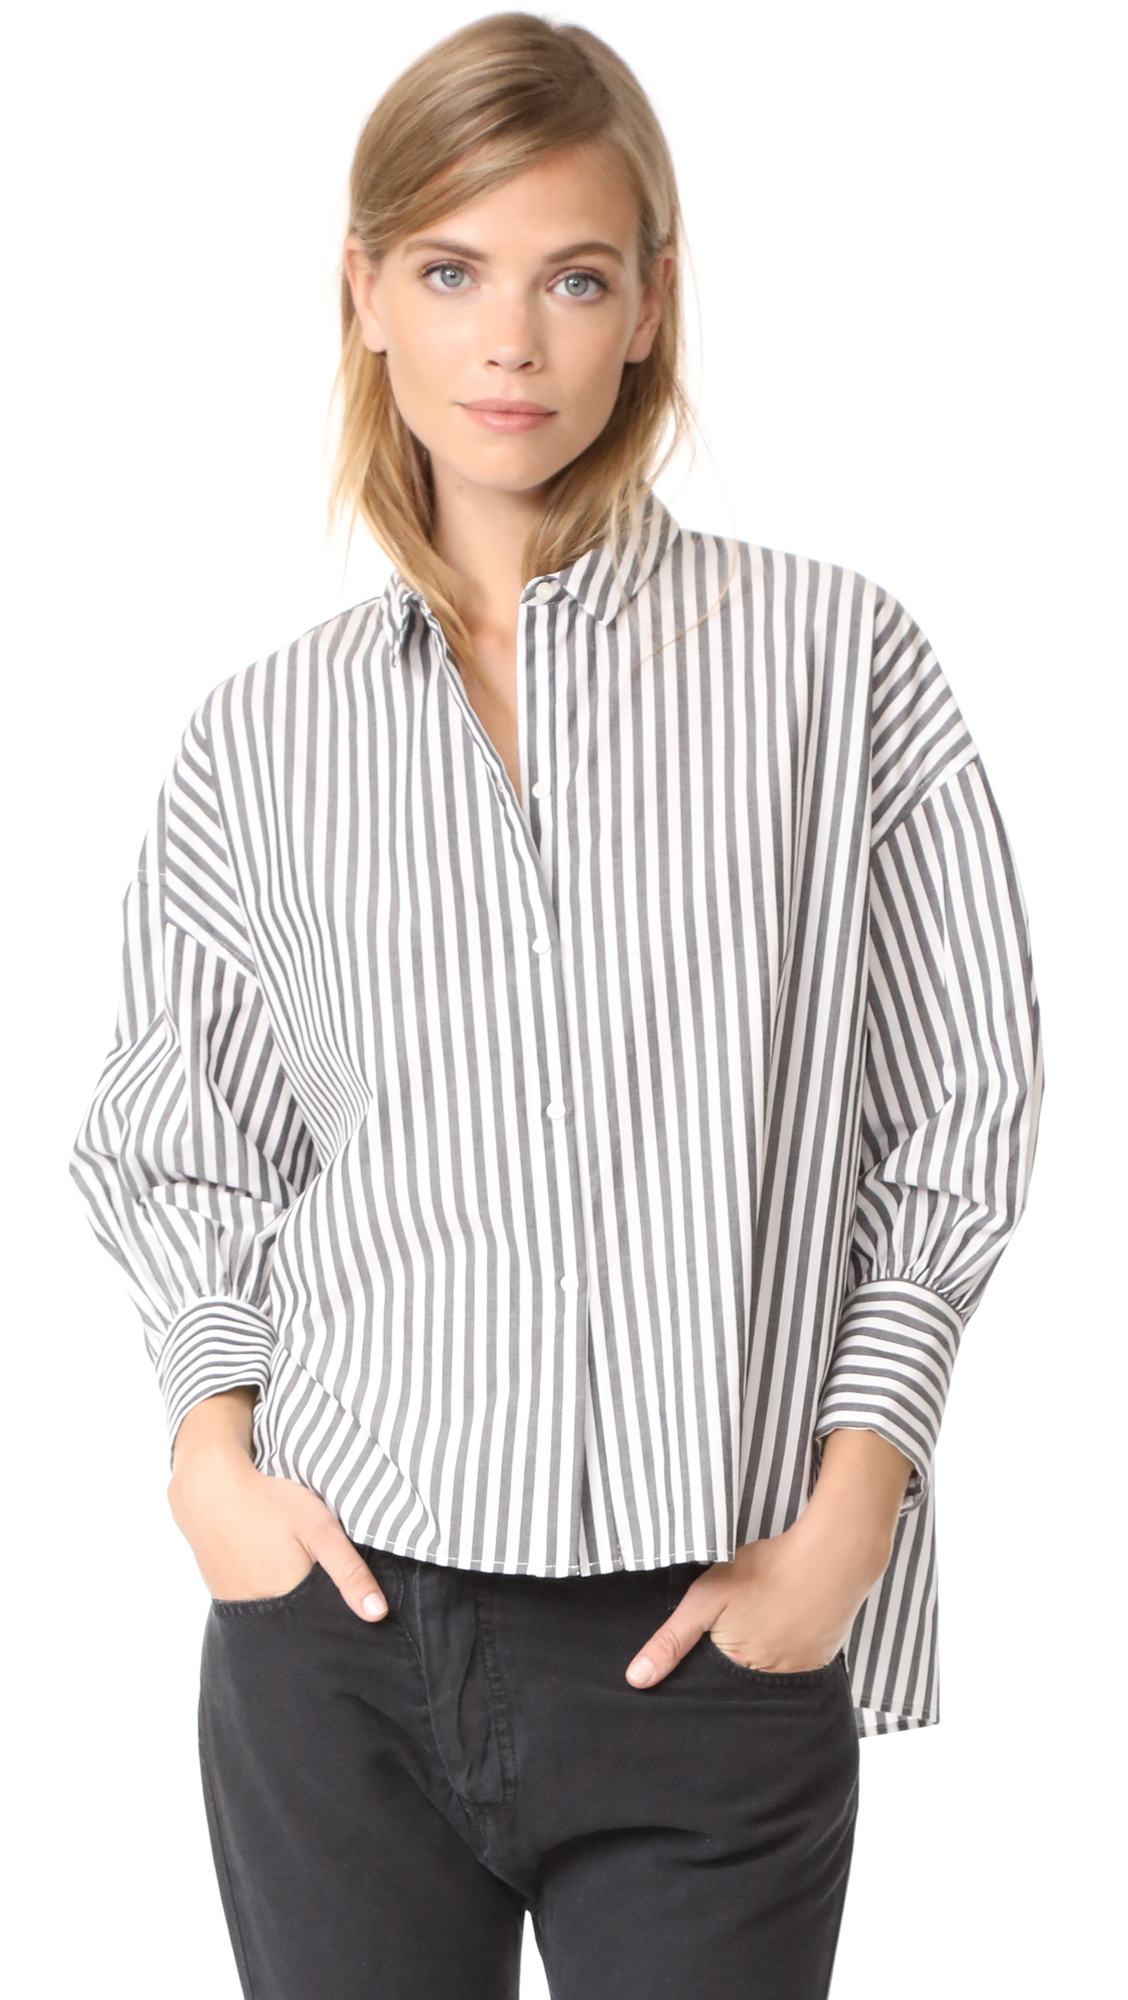 Nili Lotan Fulton Shirt - Black/White Stripe